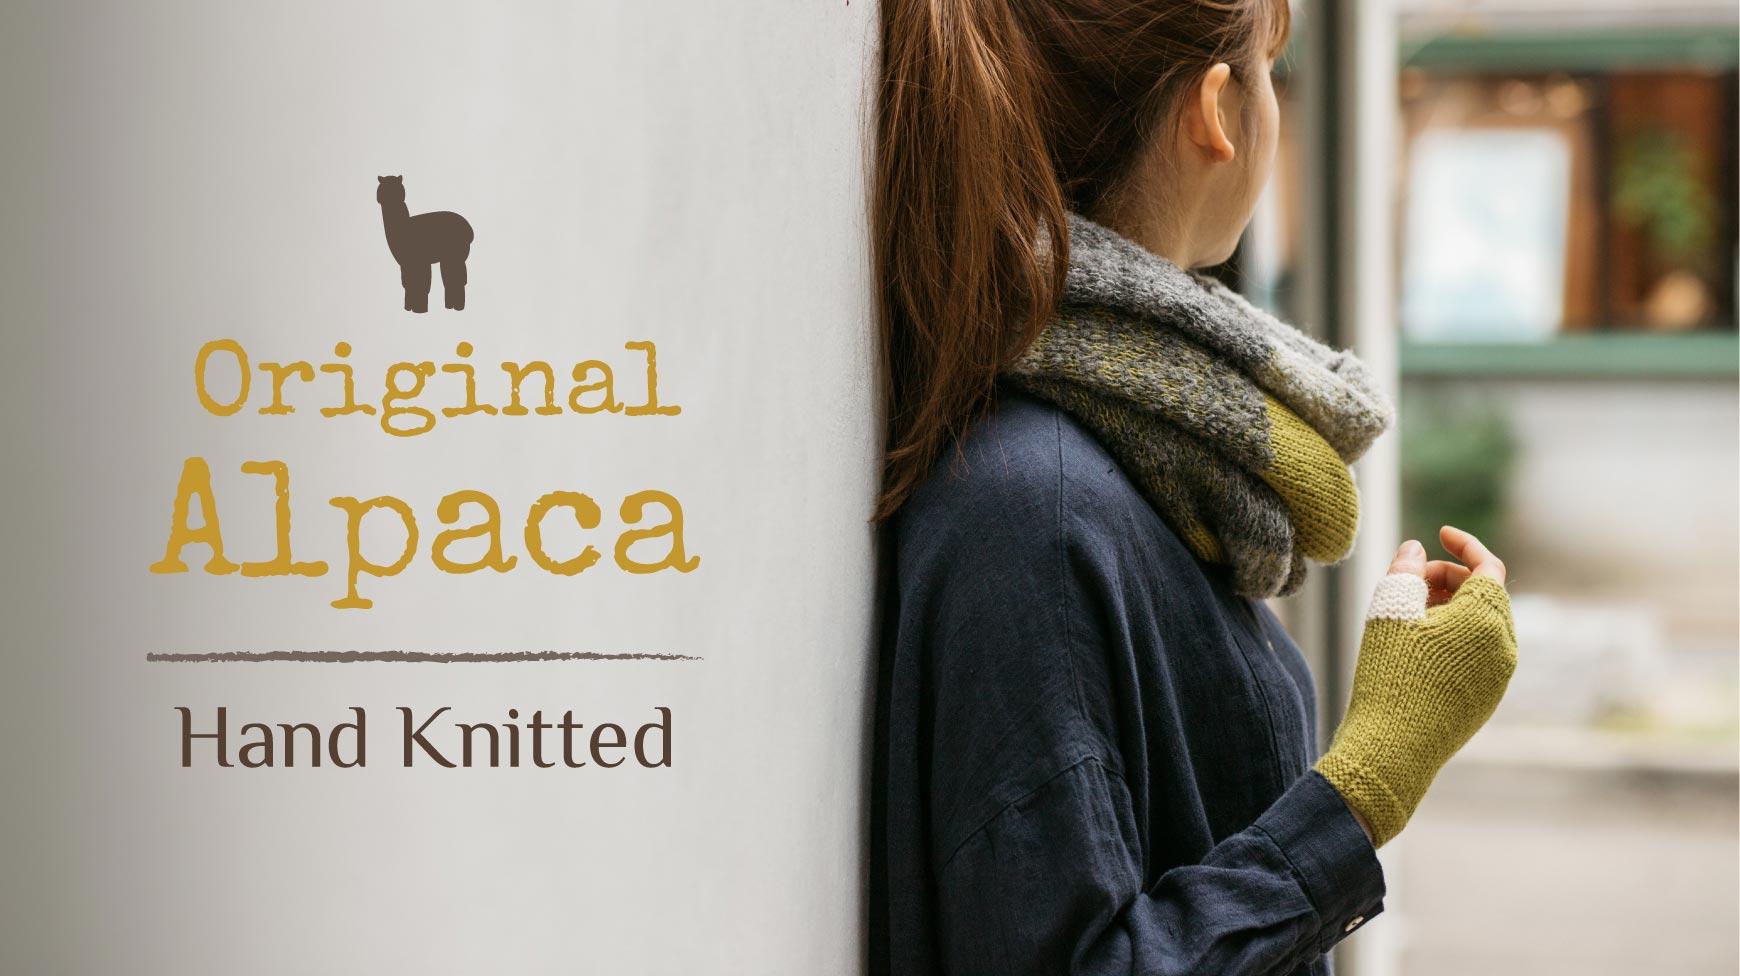 Original Alpaca - Hand Knitted